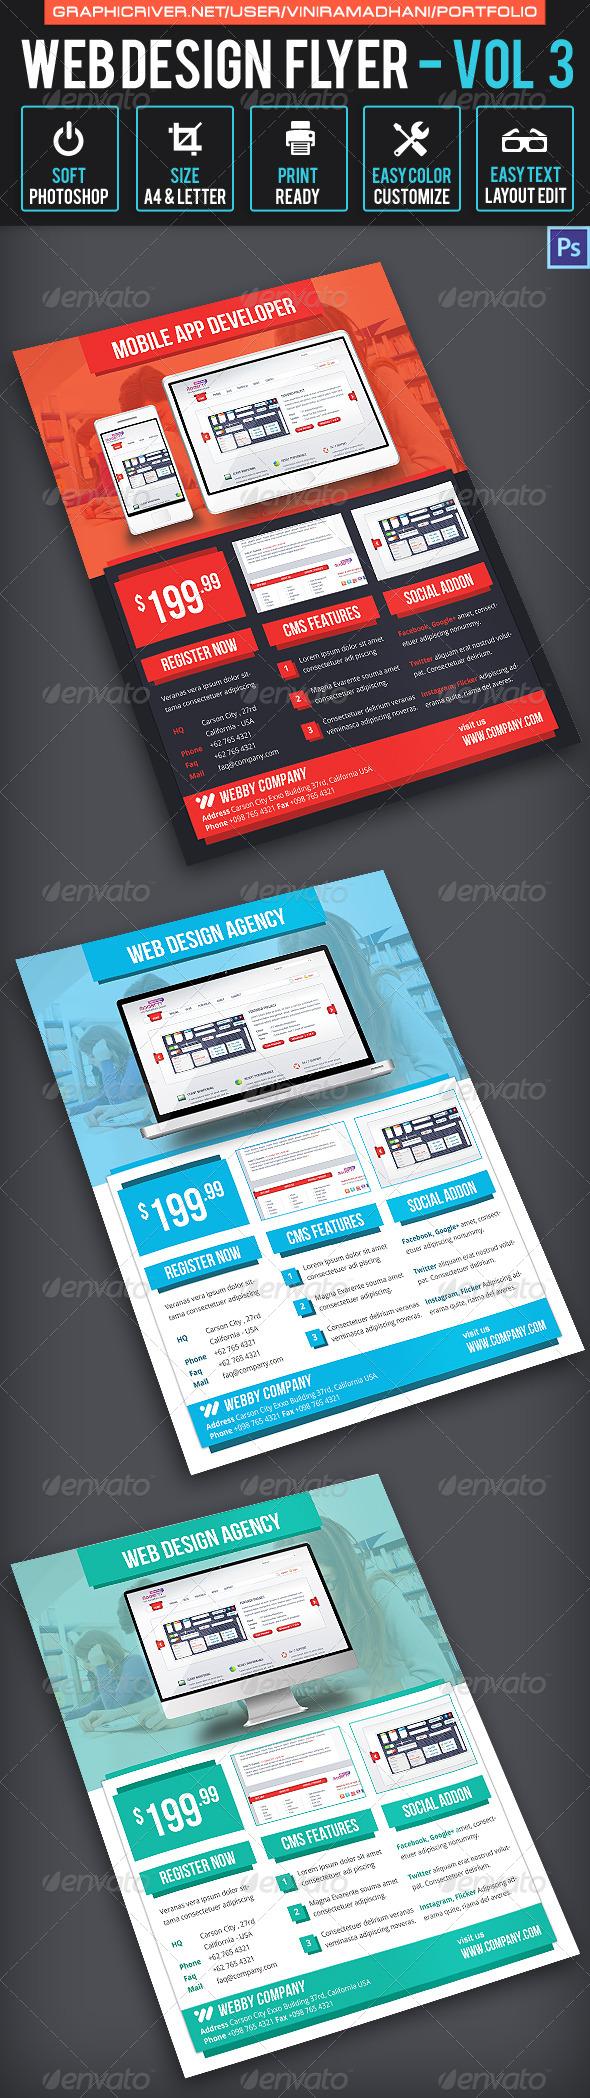 Web Design Flyer | Volume 3 - Corporate Flyers